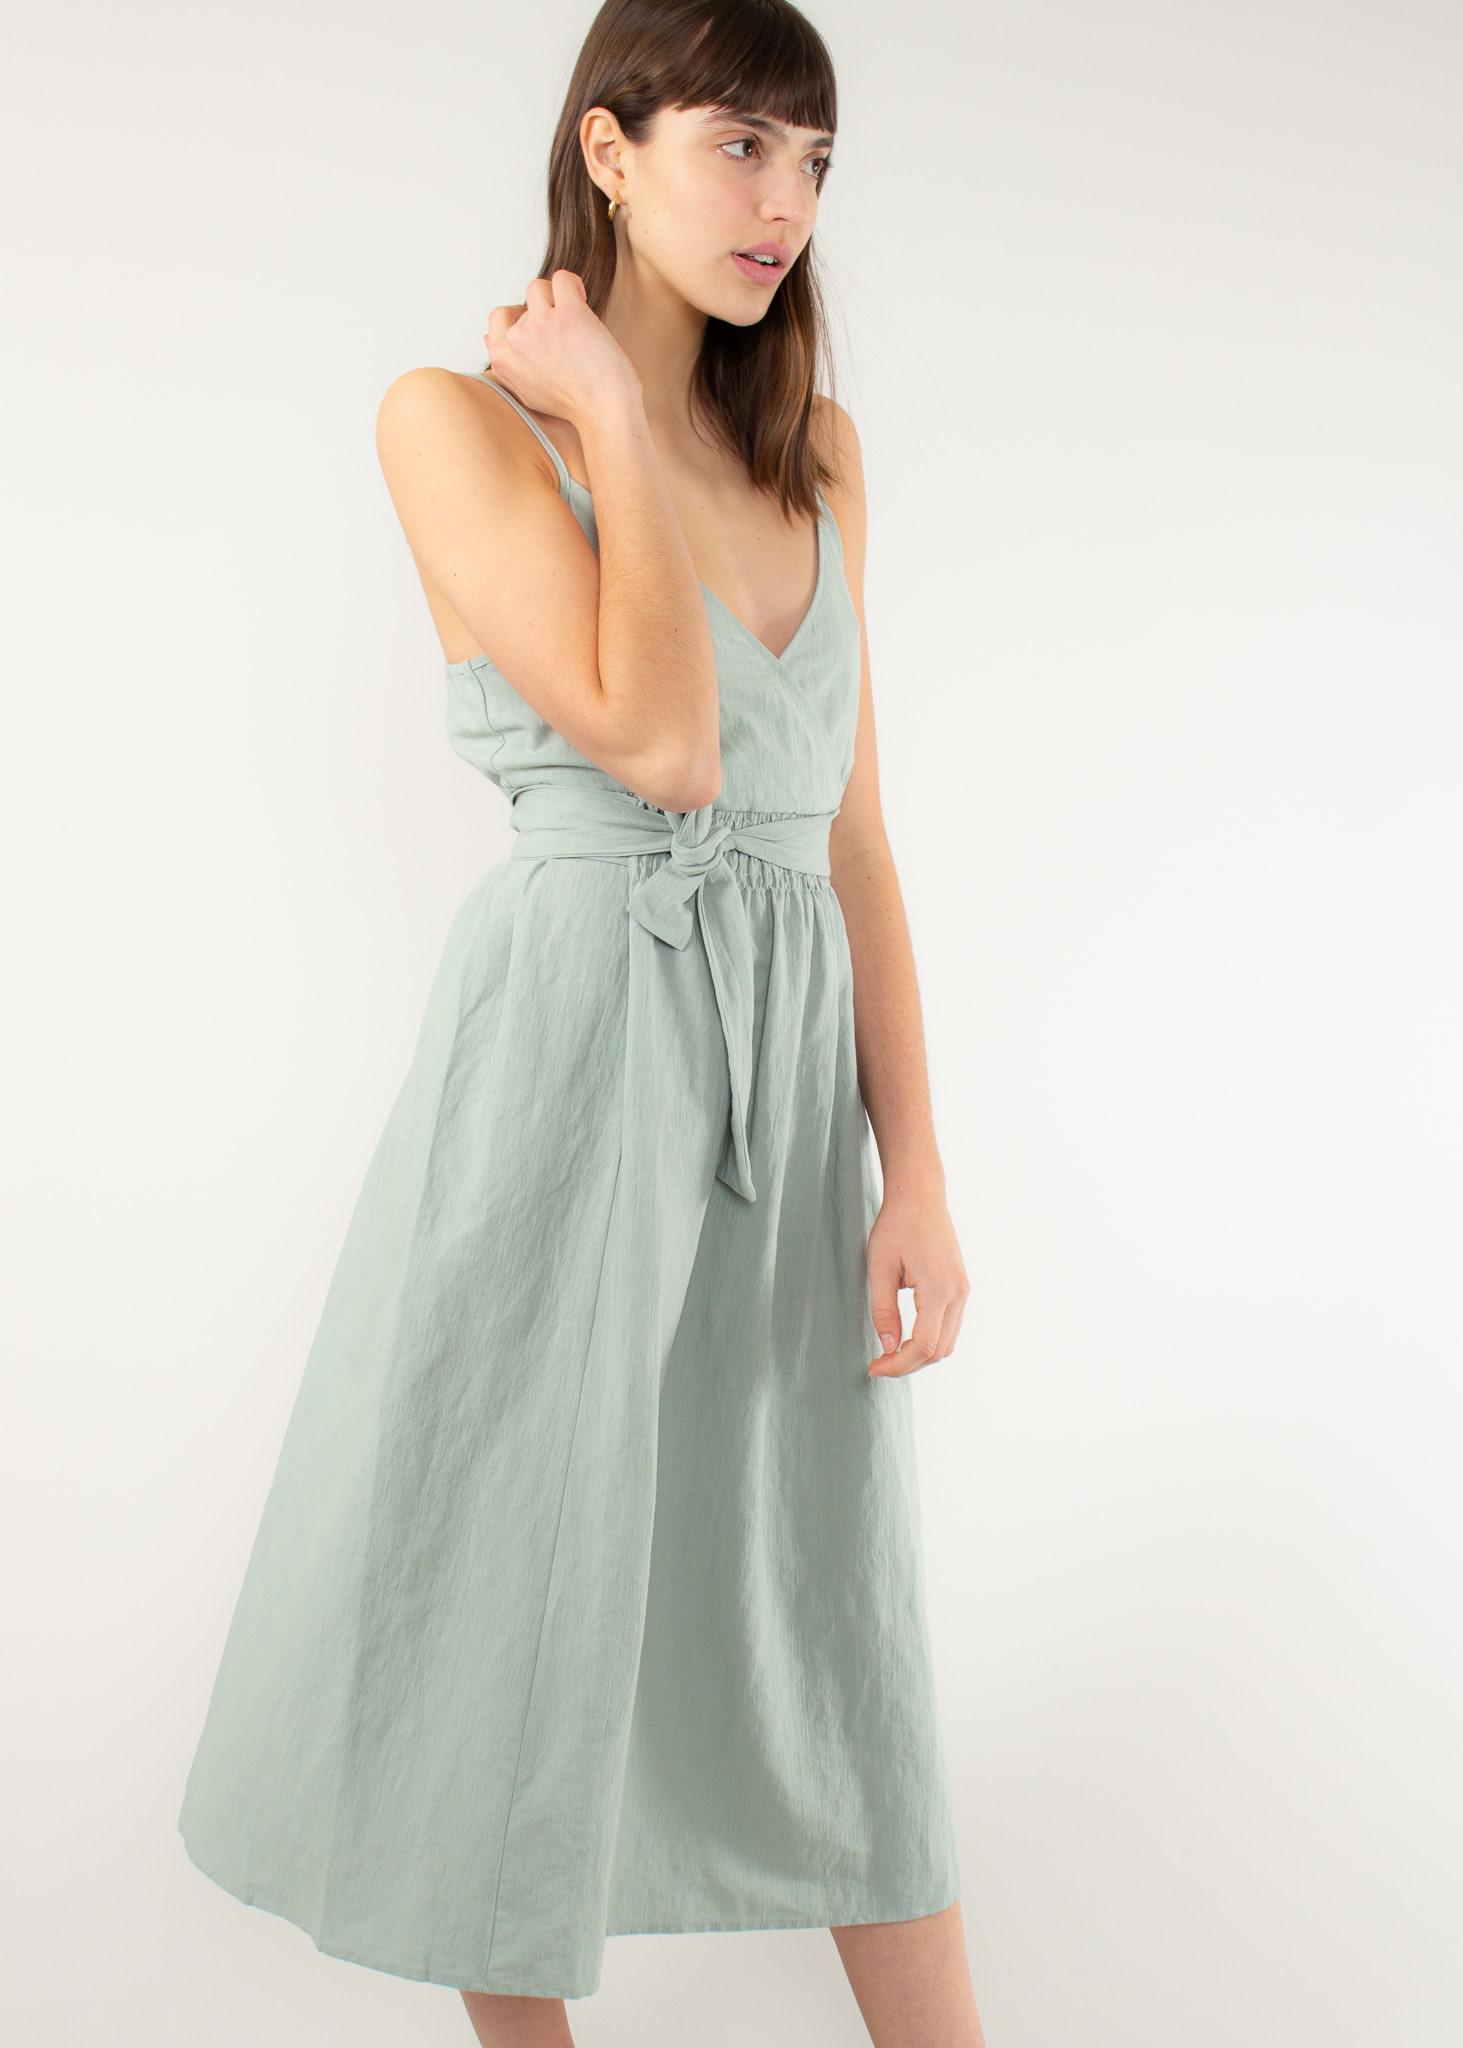 The Korner 20128063 dress